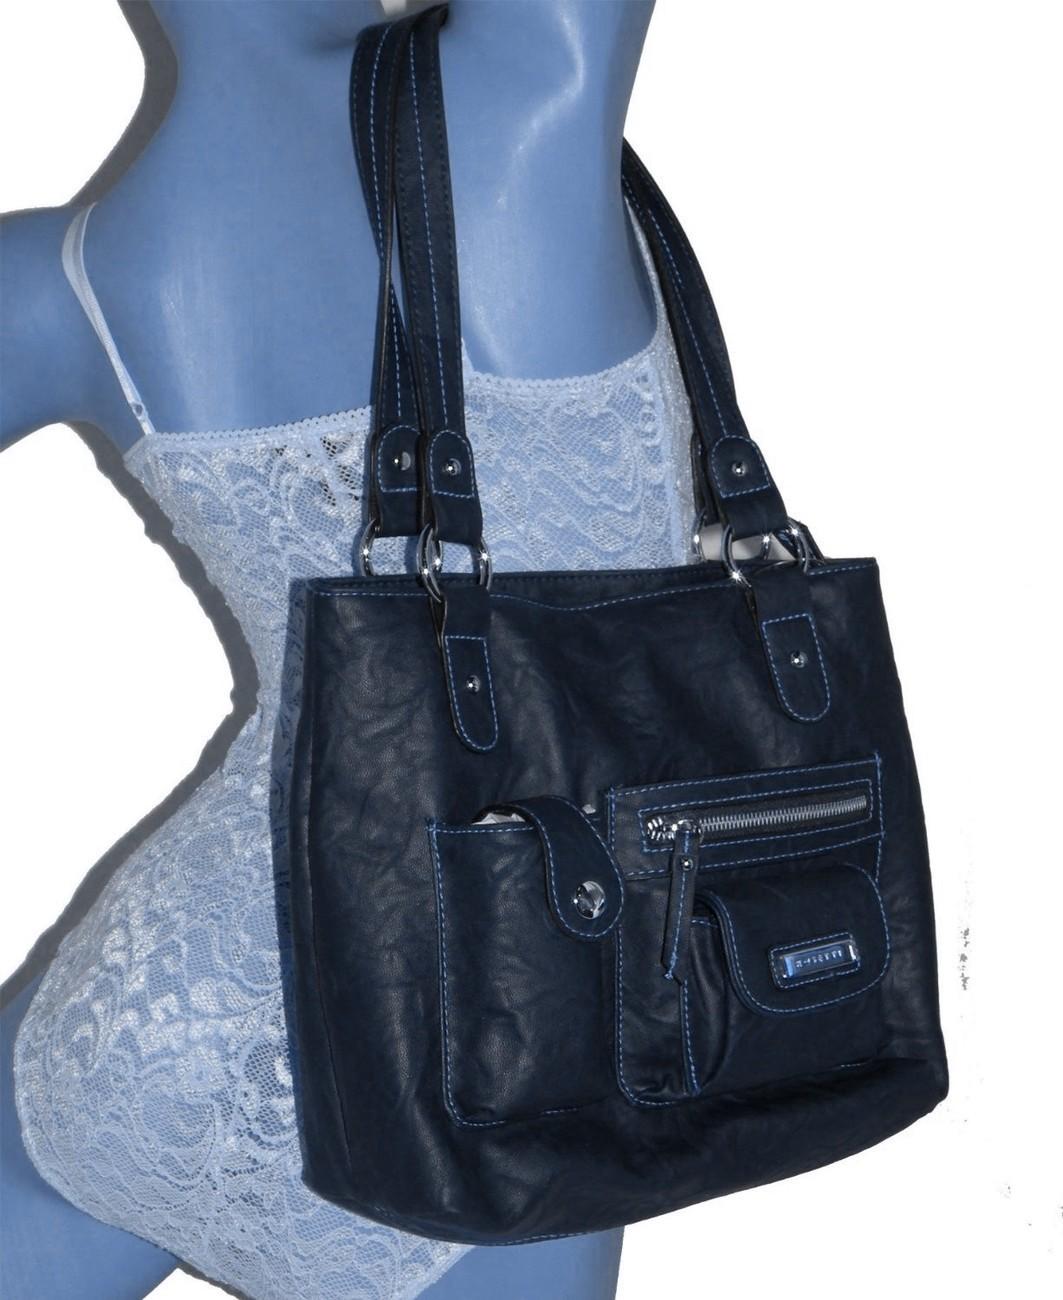 Nwt 39 s rosetti charlene black organizer handbag handbags - Organizer purses and handbags ...